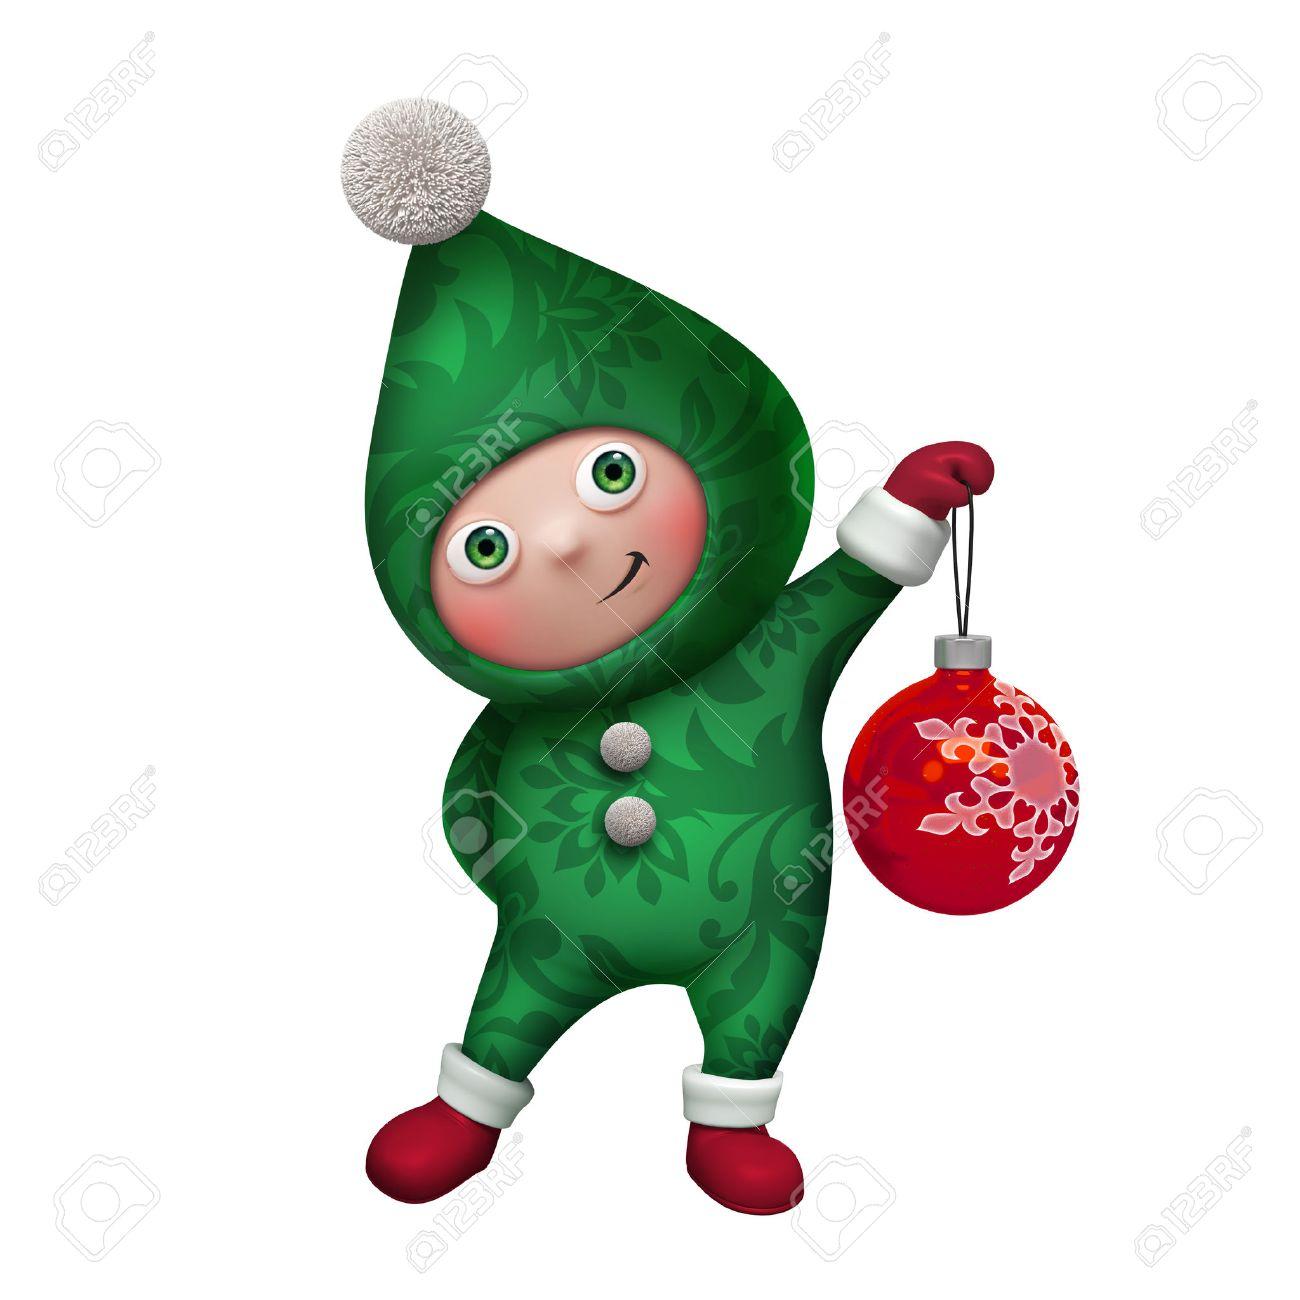 Cute Funny Christmas Elf Cartoon Holding Glass Ball Clip Art Stock ...